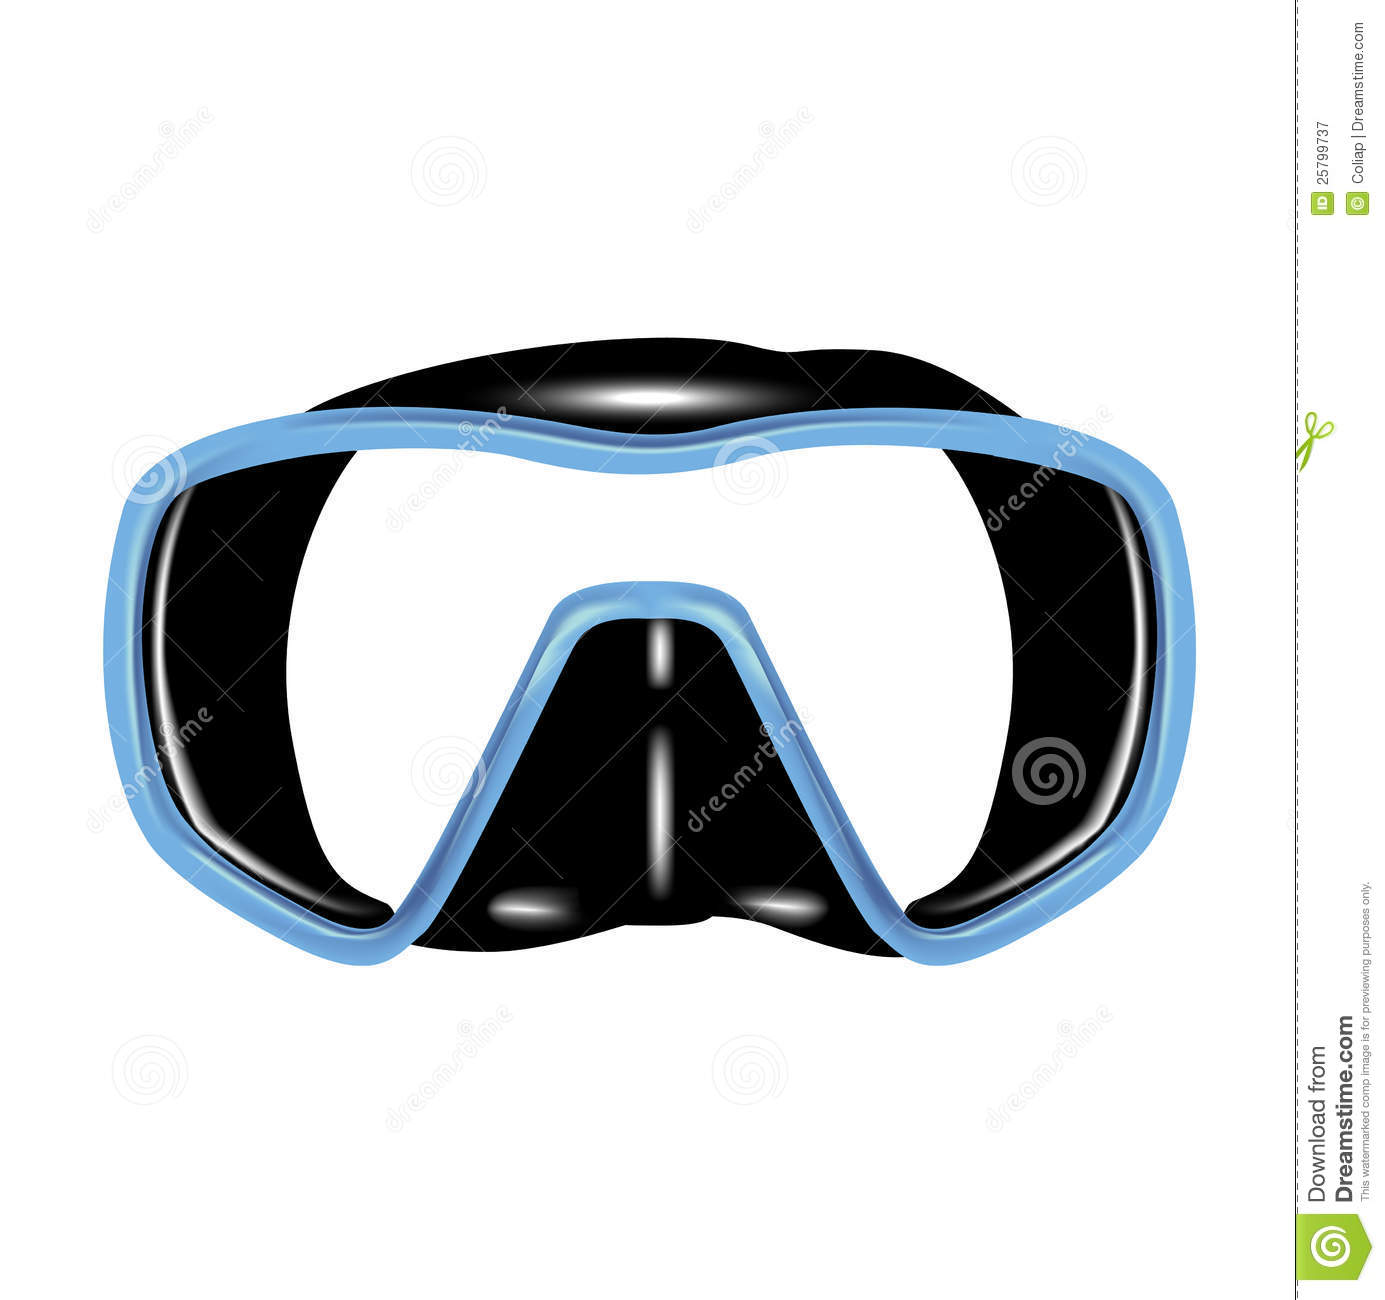 Scuba mask clipart freeuse download Scuba mask clipart 1 » Clipart Station freeuse download